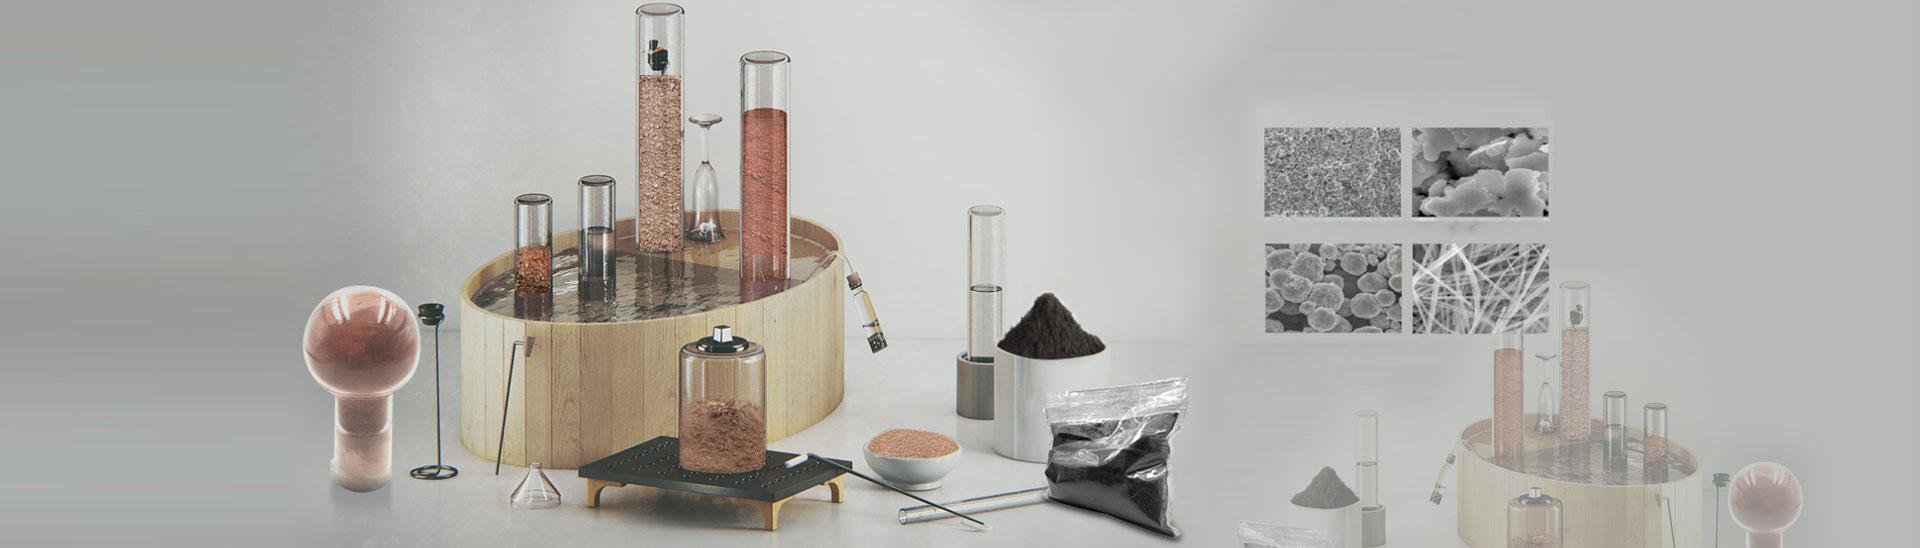 Copper powder manufacturer